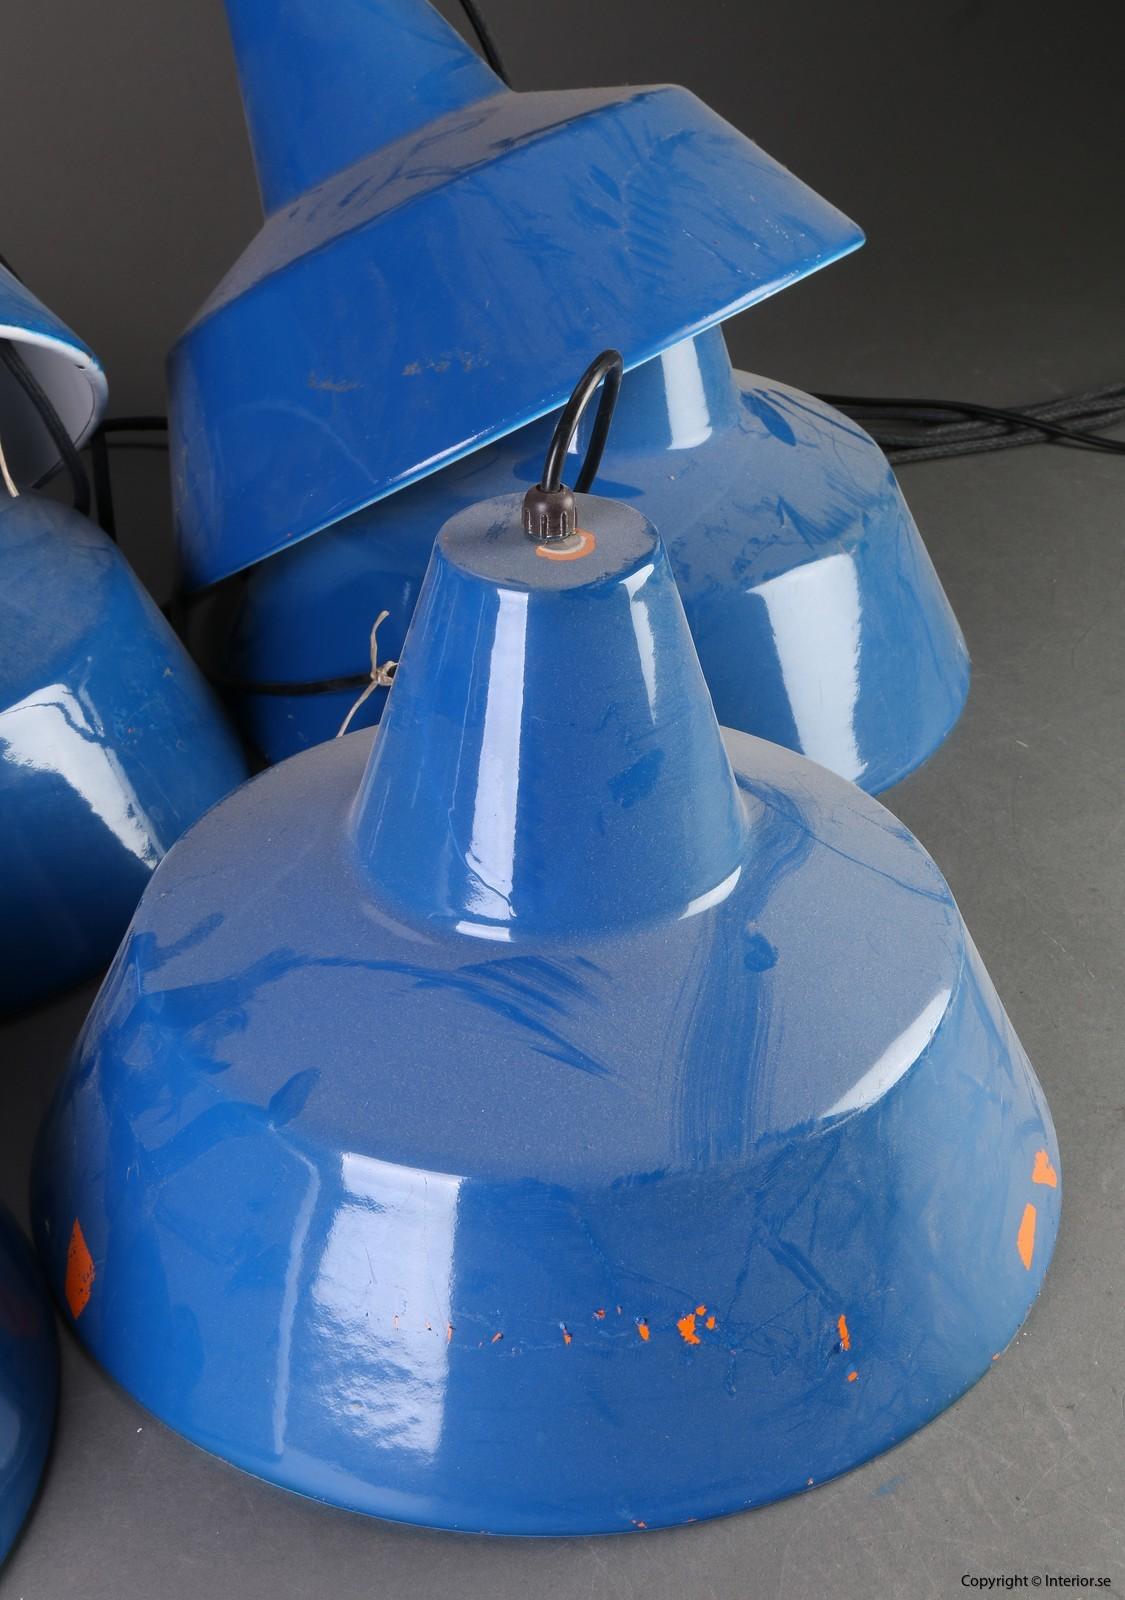 Louis Poulsen Industri lampor - Blå Industri industry design 2